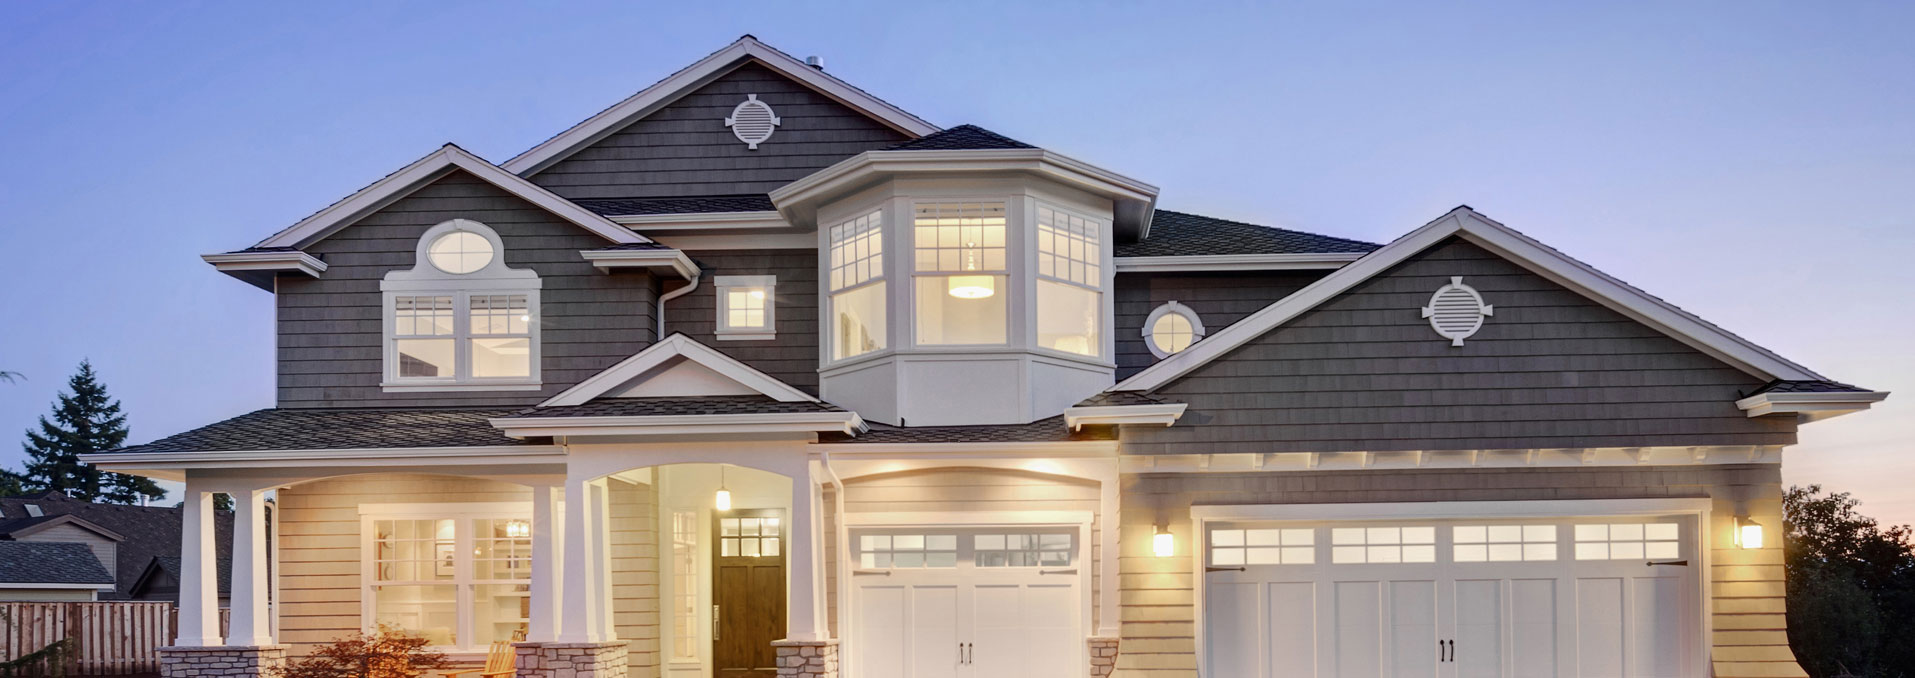 Home Equity Loan | Brampton Mortgage Broker - Rumy Gill